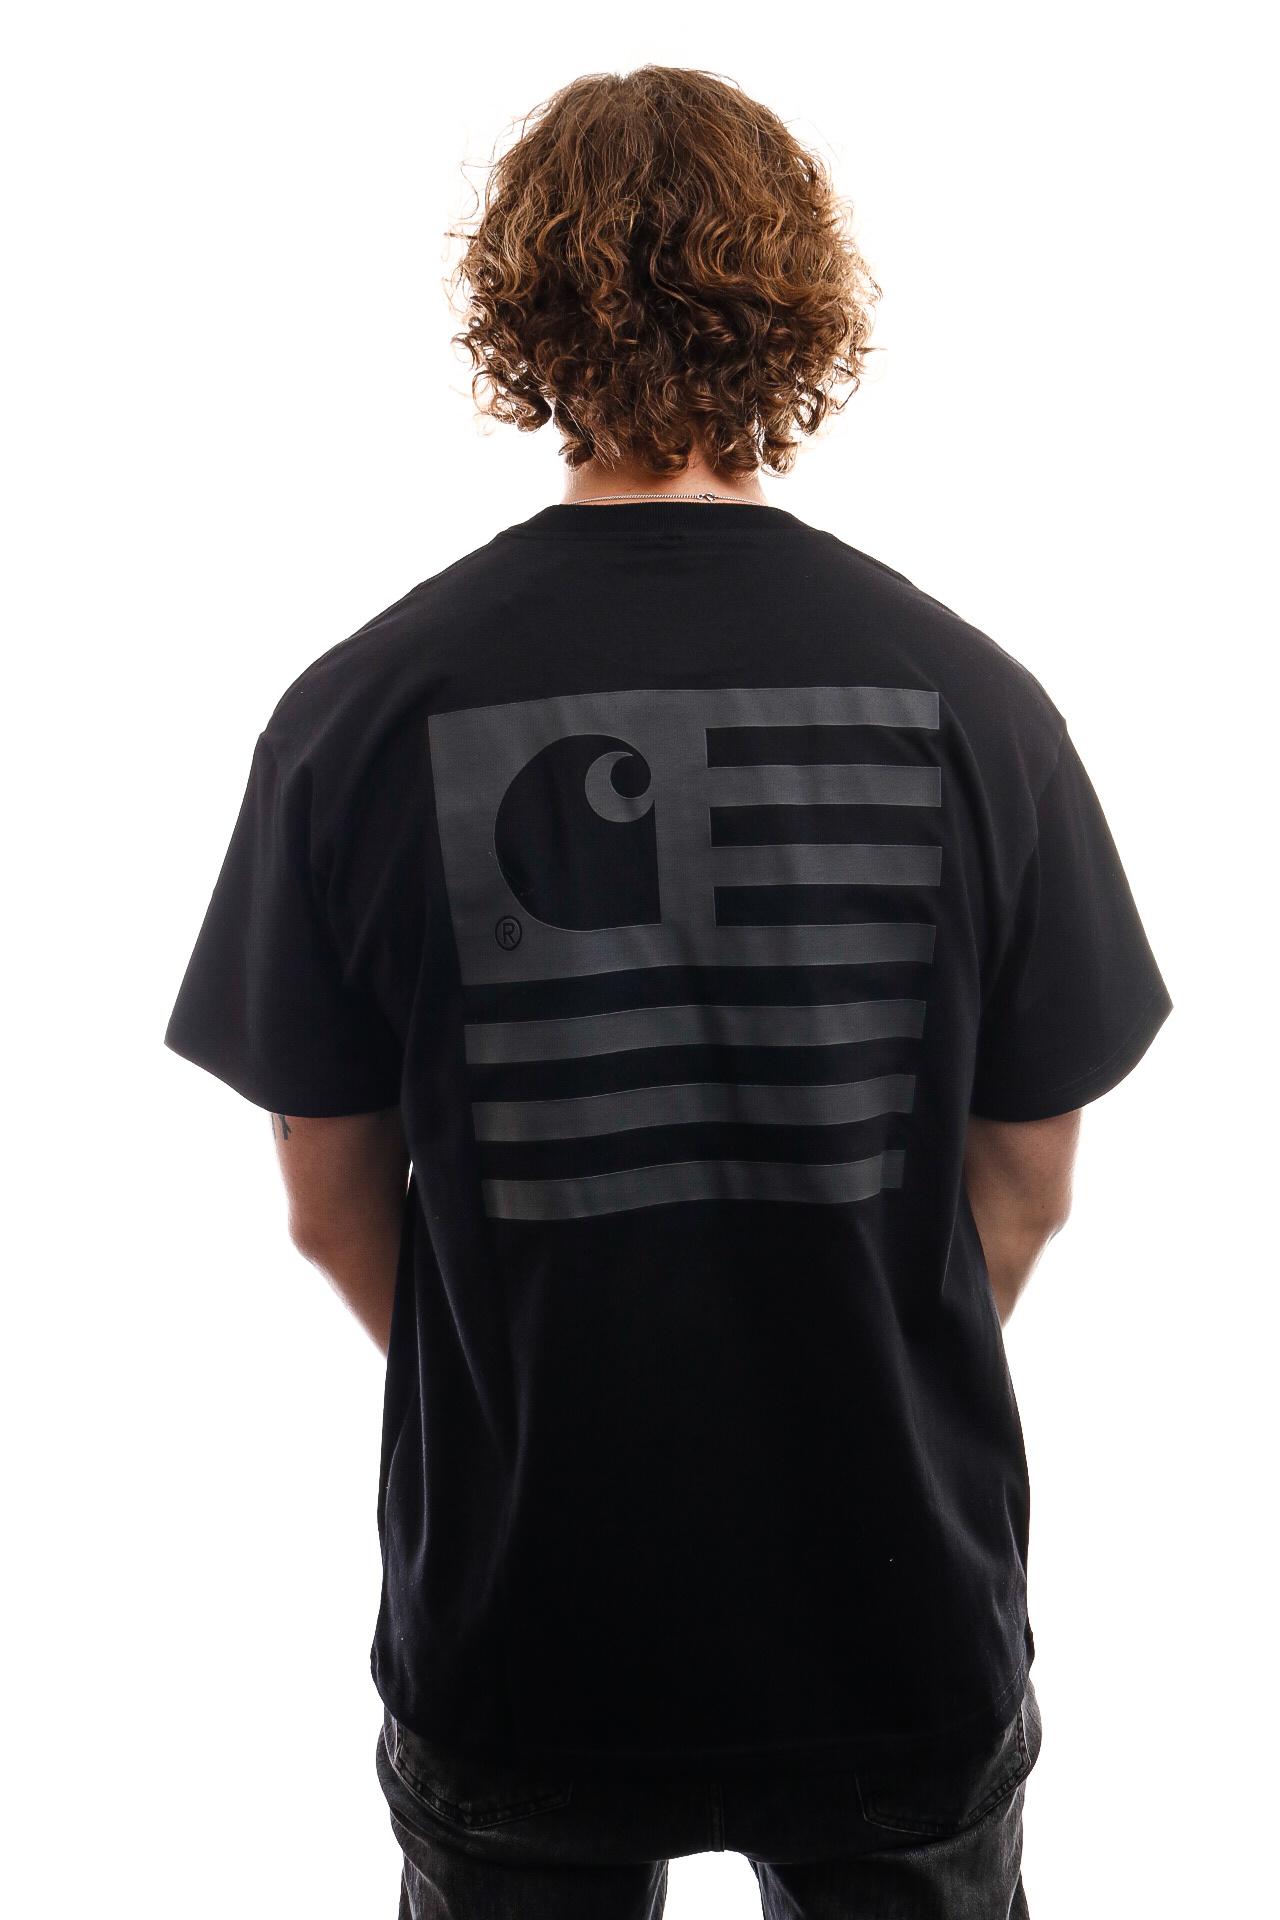 Foto van Carhartt T-Shirt S/S State T-Shirt Black / Black I028434